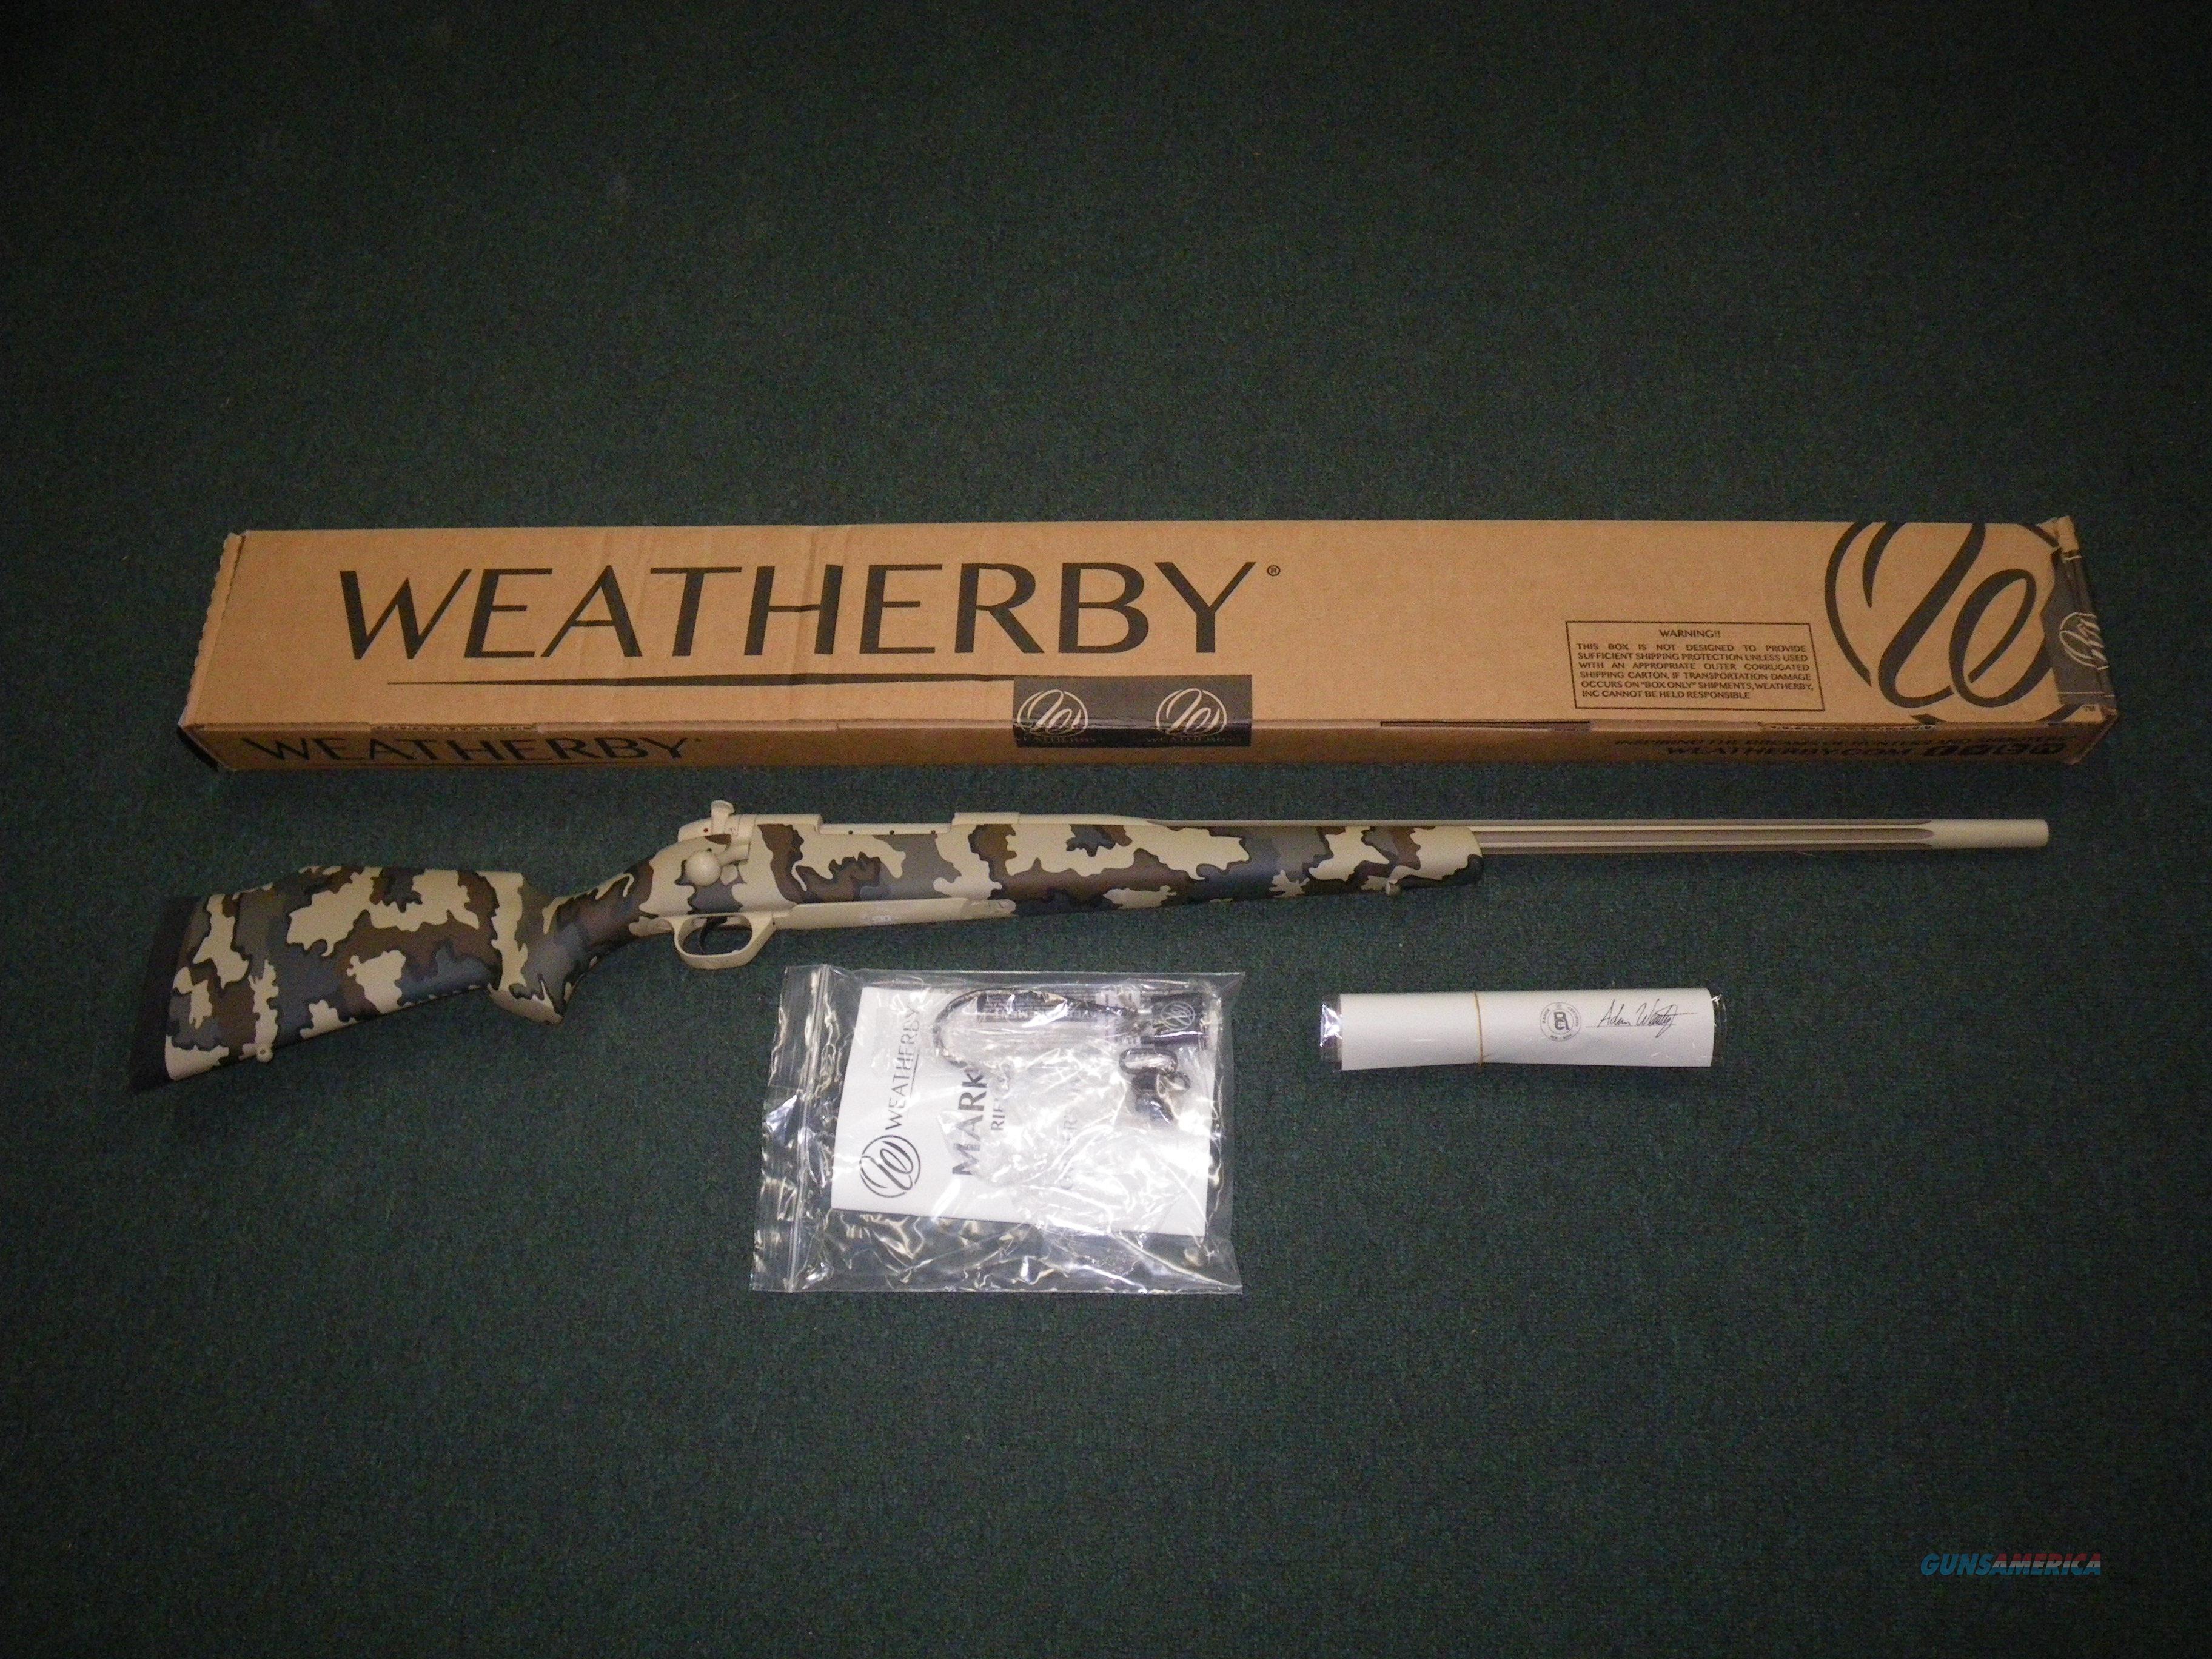 "Weatherby Mark V Arroyo RC 6.5-300 Wby Mag 26"" NEW #MAYM653WR6O  Guns > Rifles > Weatherby Rifles > Sporting"